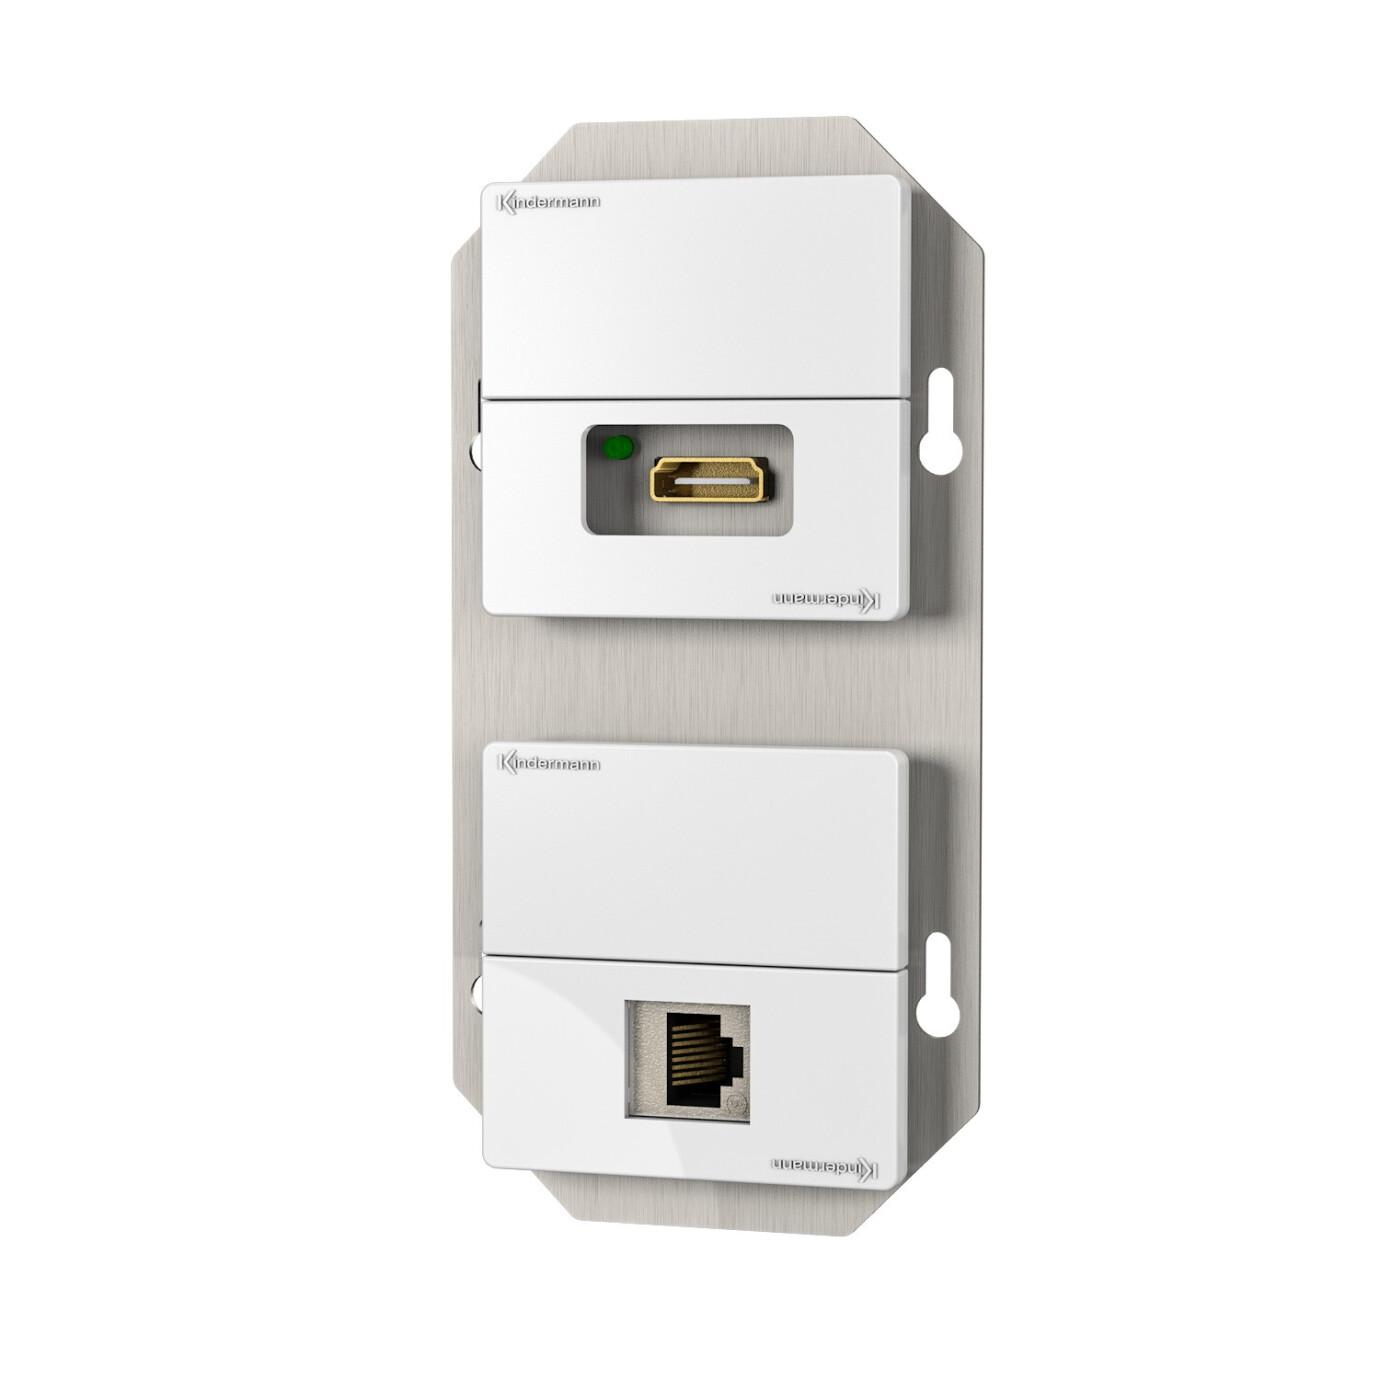 Kindermann Konnect design click HDMI Transmitter